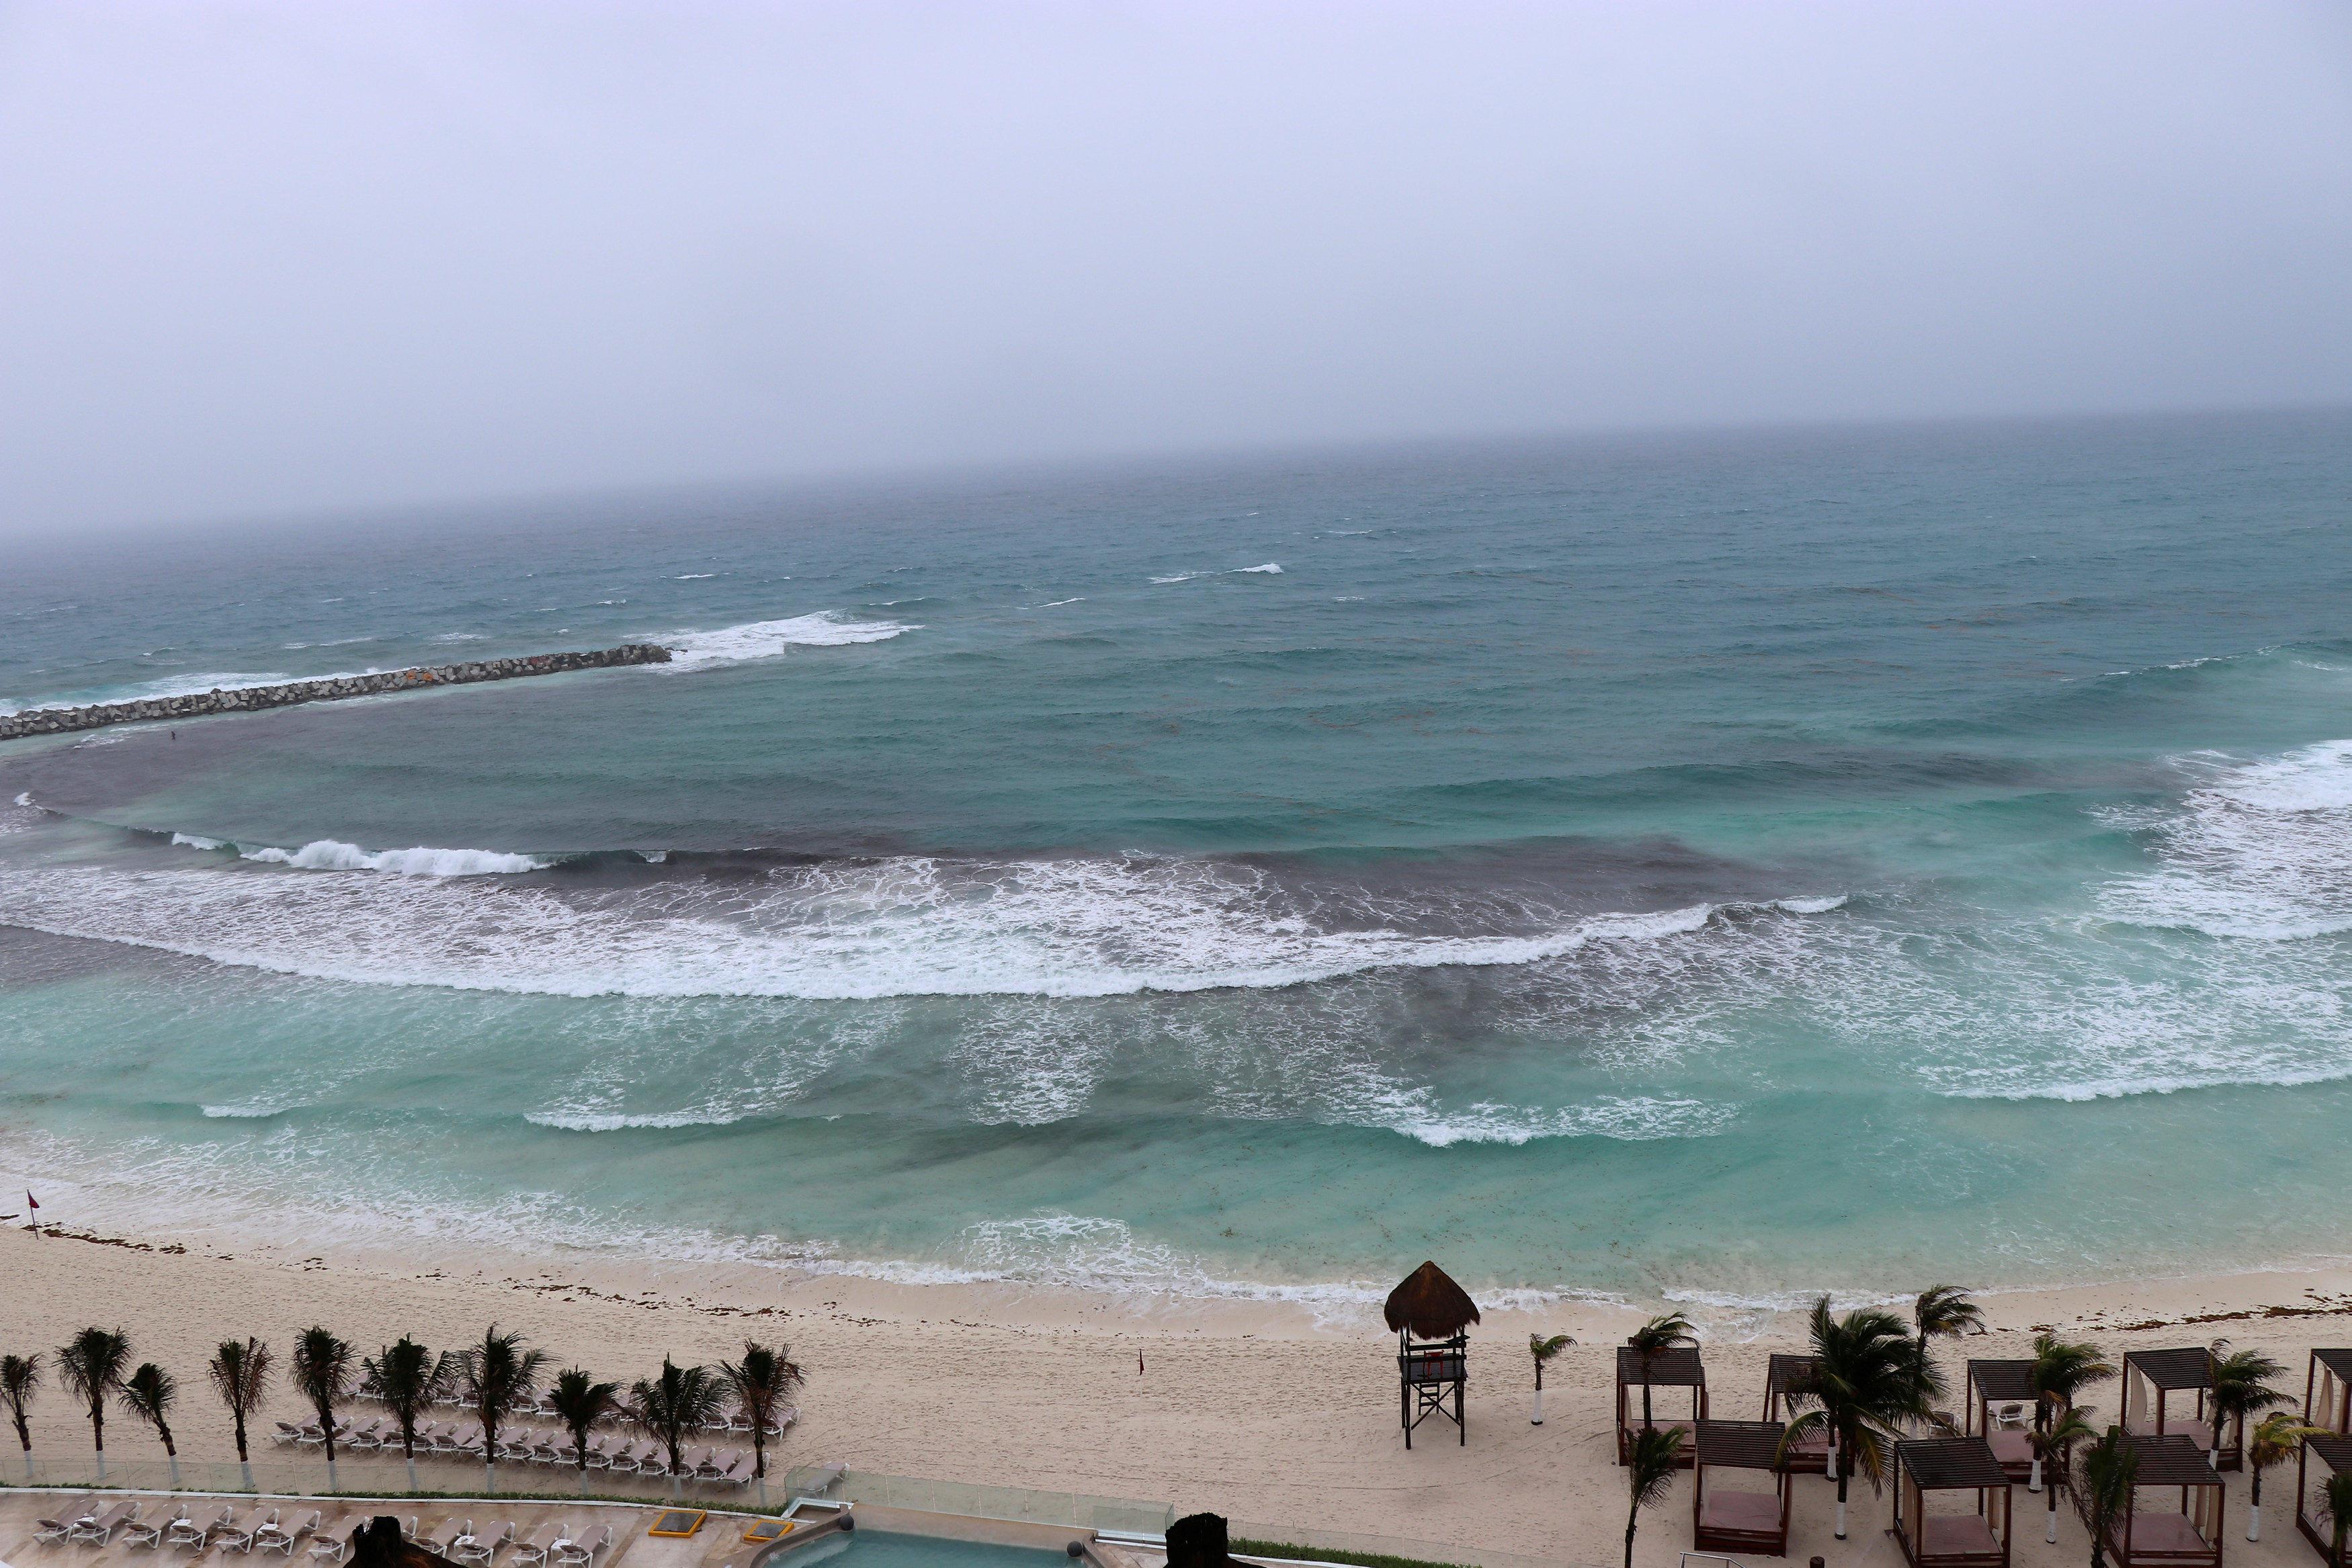 Subtropical storm Alberto: Tropical storm watch as strom